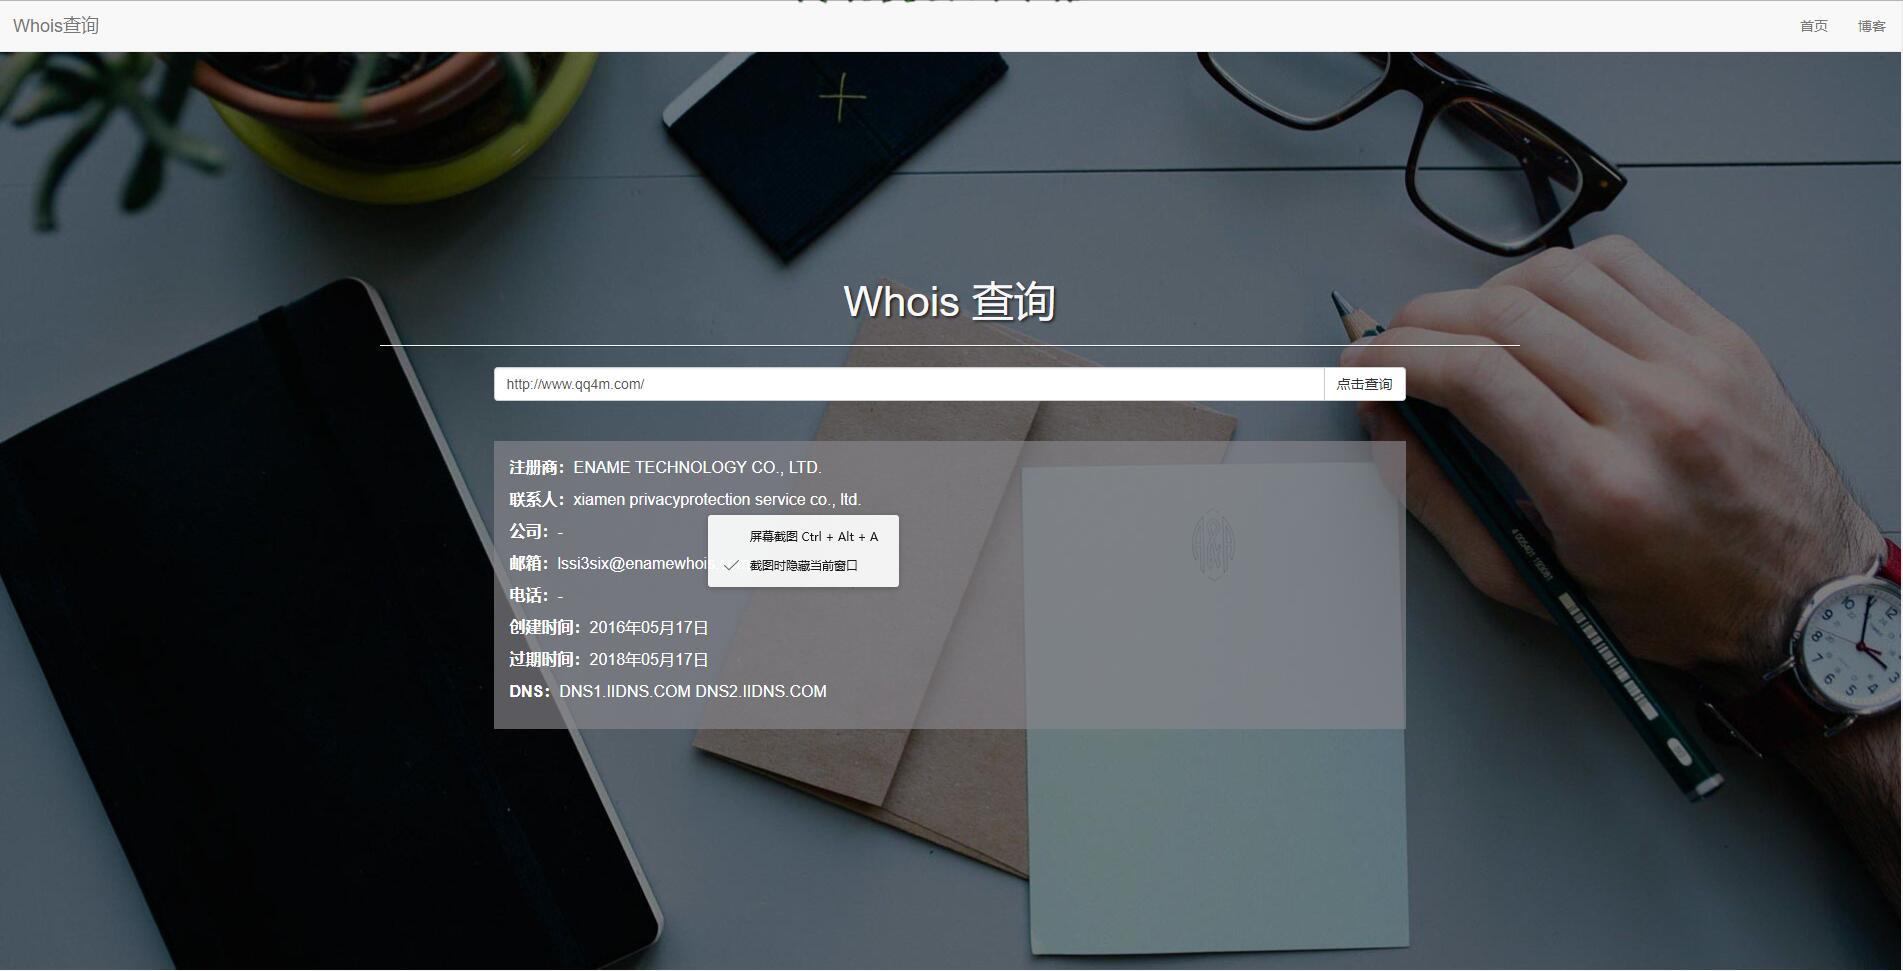 whois在线查询HTML单页源码